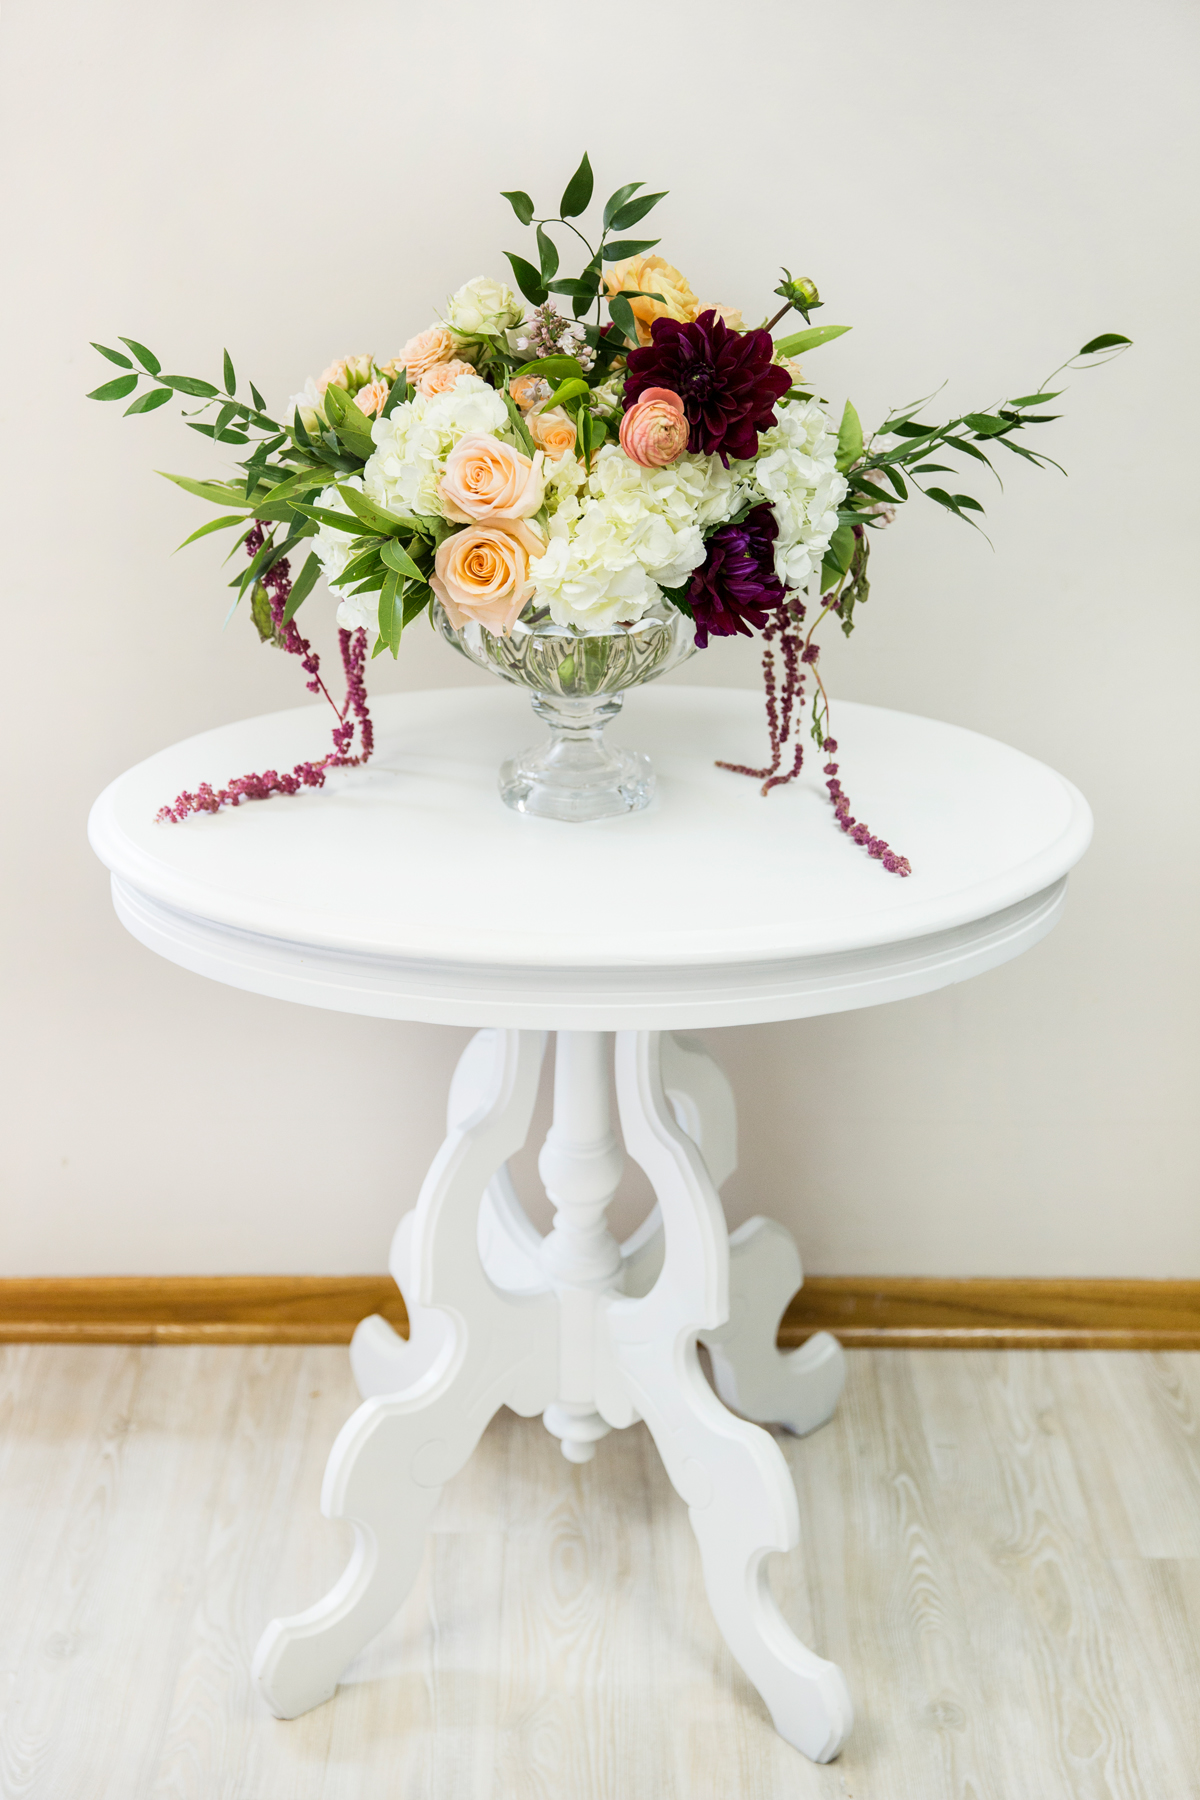 Sadies Floral Couture